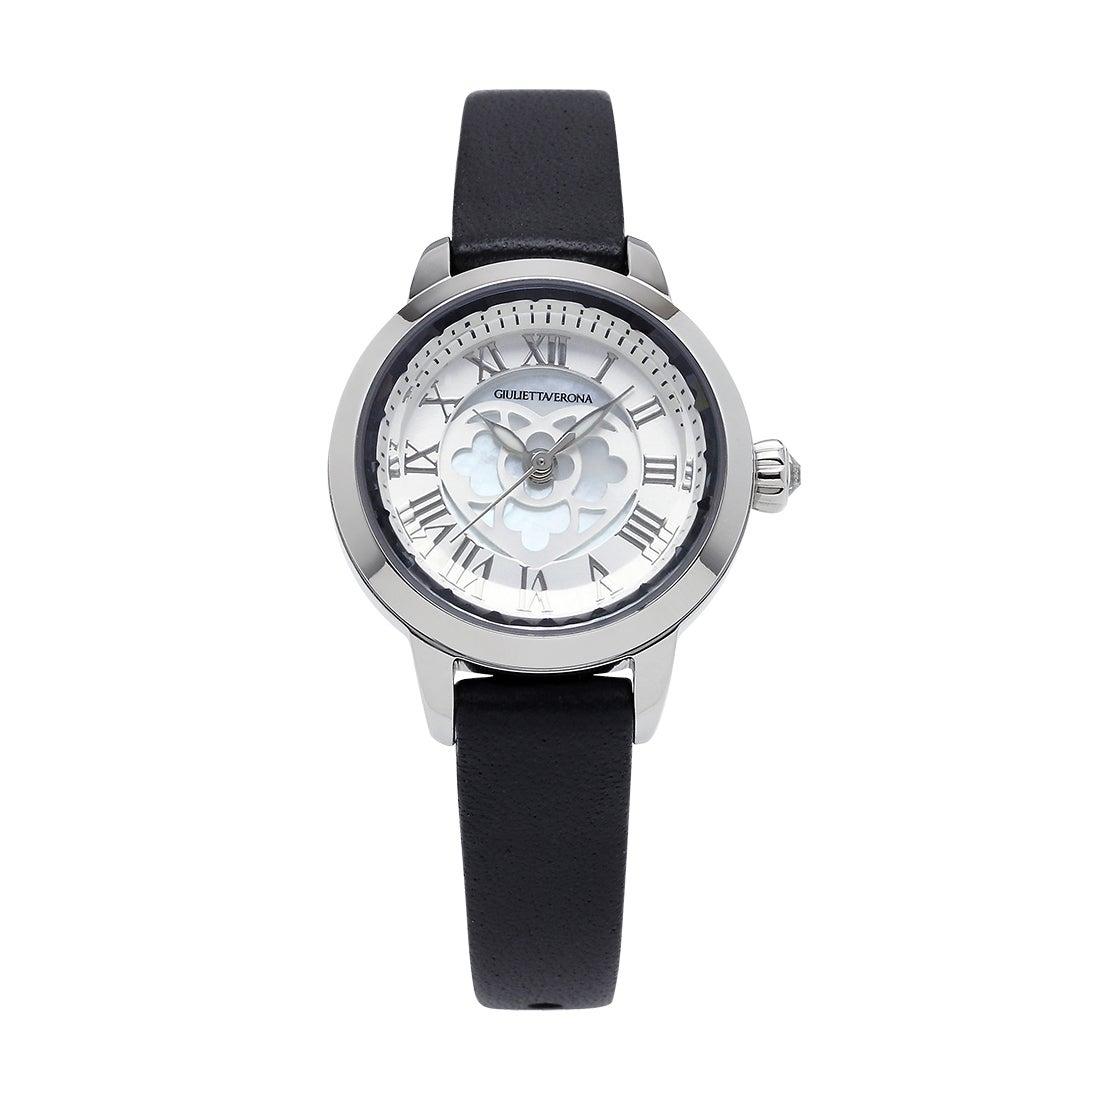 【SAC'S BAR】ジュリエッタヴェローナ GIULIETTAVERONA 腕時計 GV003 LOVE VERONA シルバー×ブラック